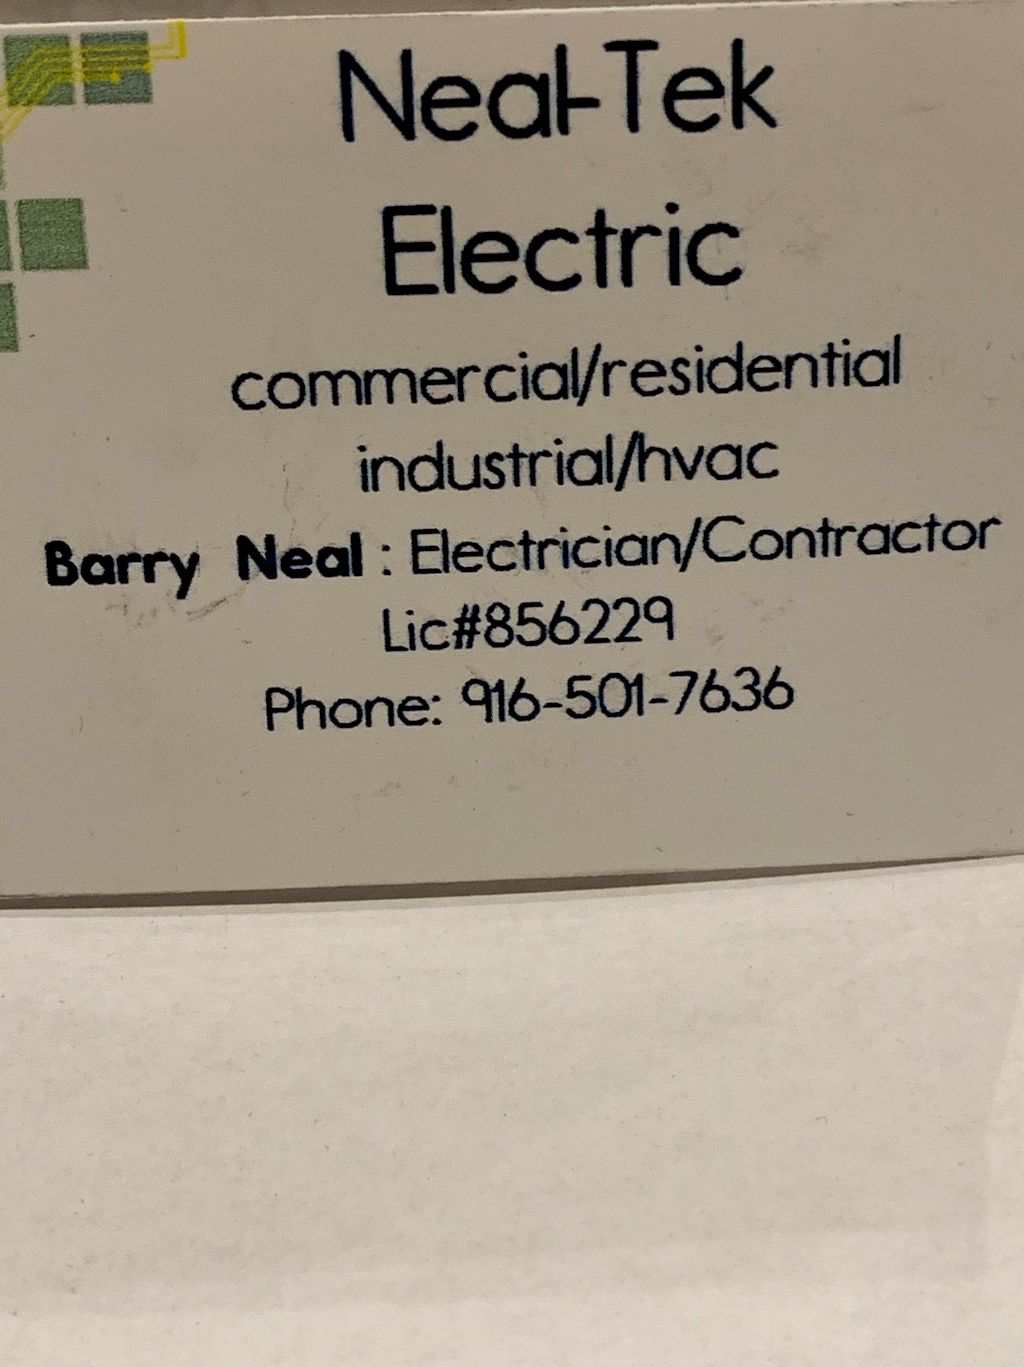 Neal-Tek Electric